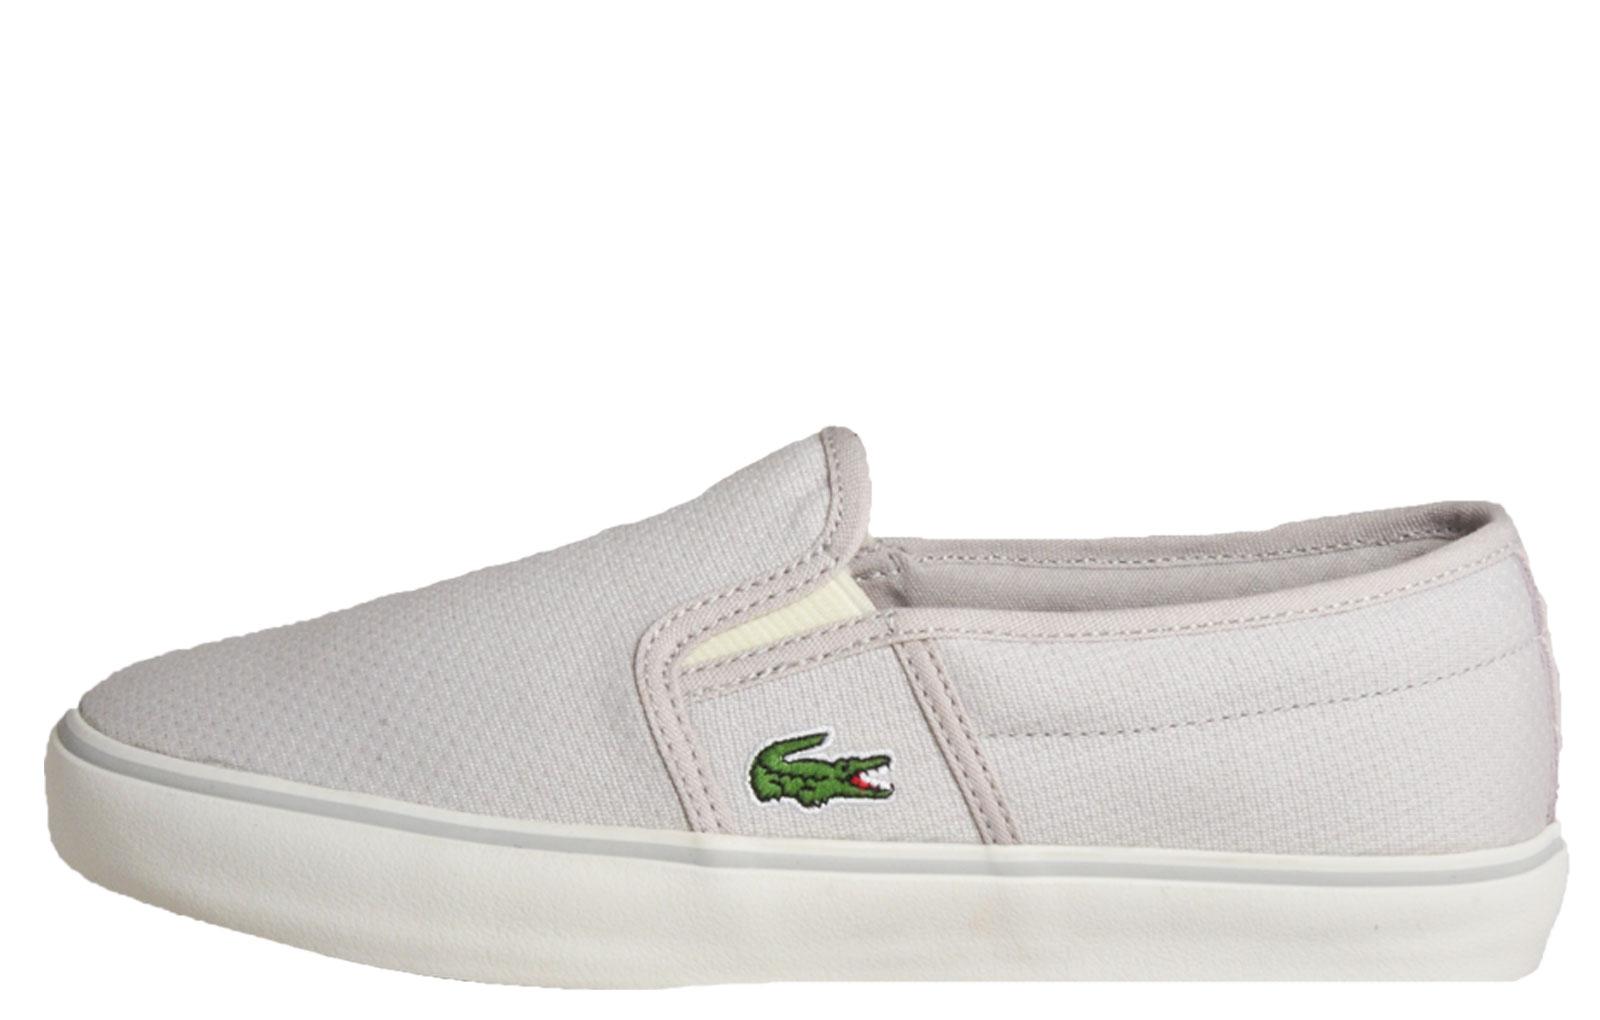 d4ddf4cd17b3e9 Lacoste Gazon 116 Womens Designer Slip-On Classic Casual Trainers Light Grey